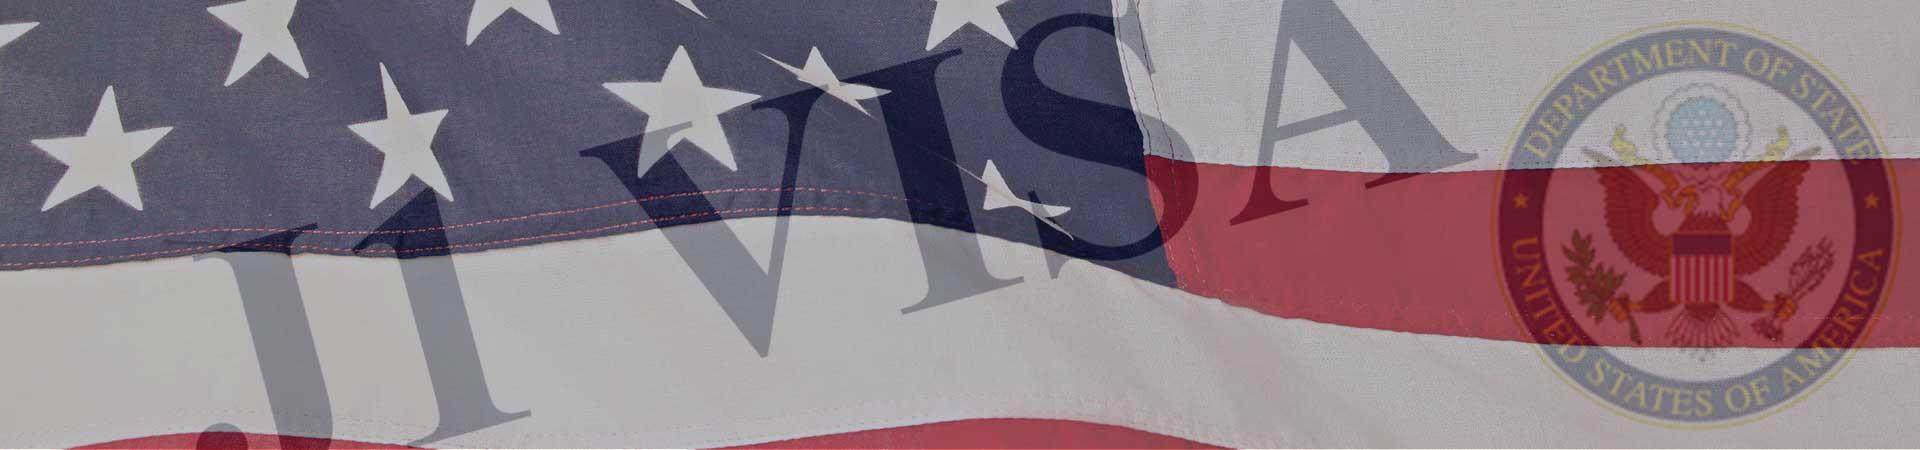 DS2019 Form and J1 Visa